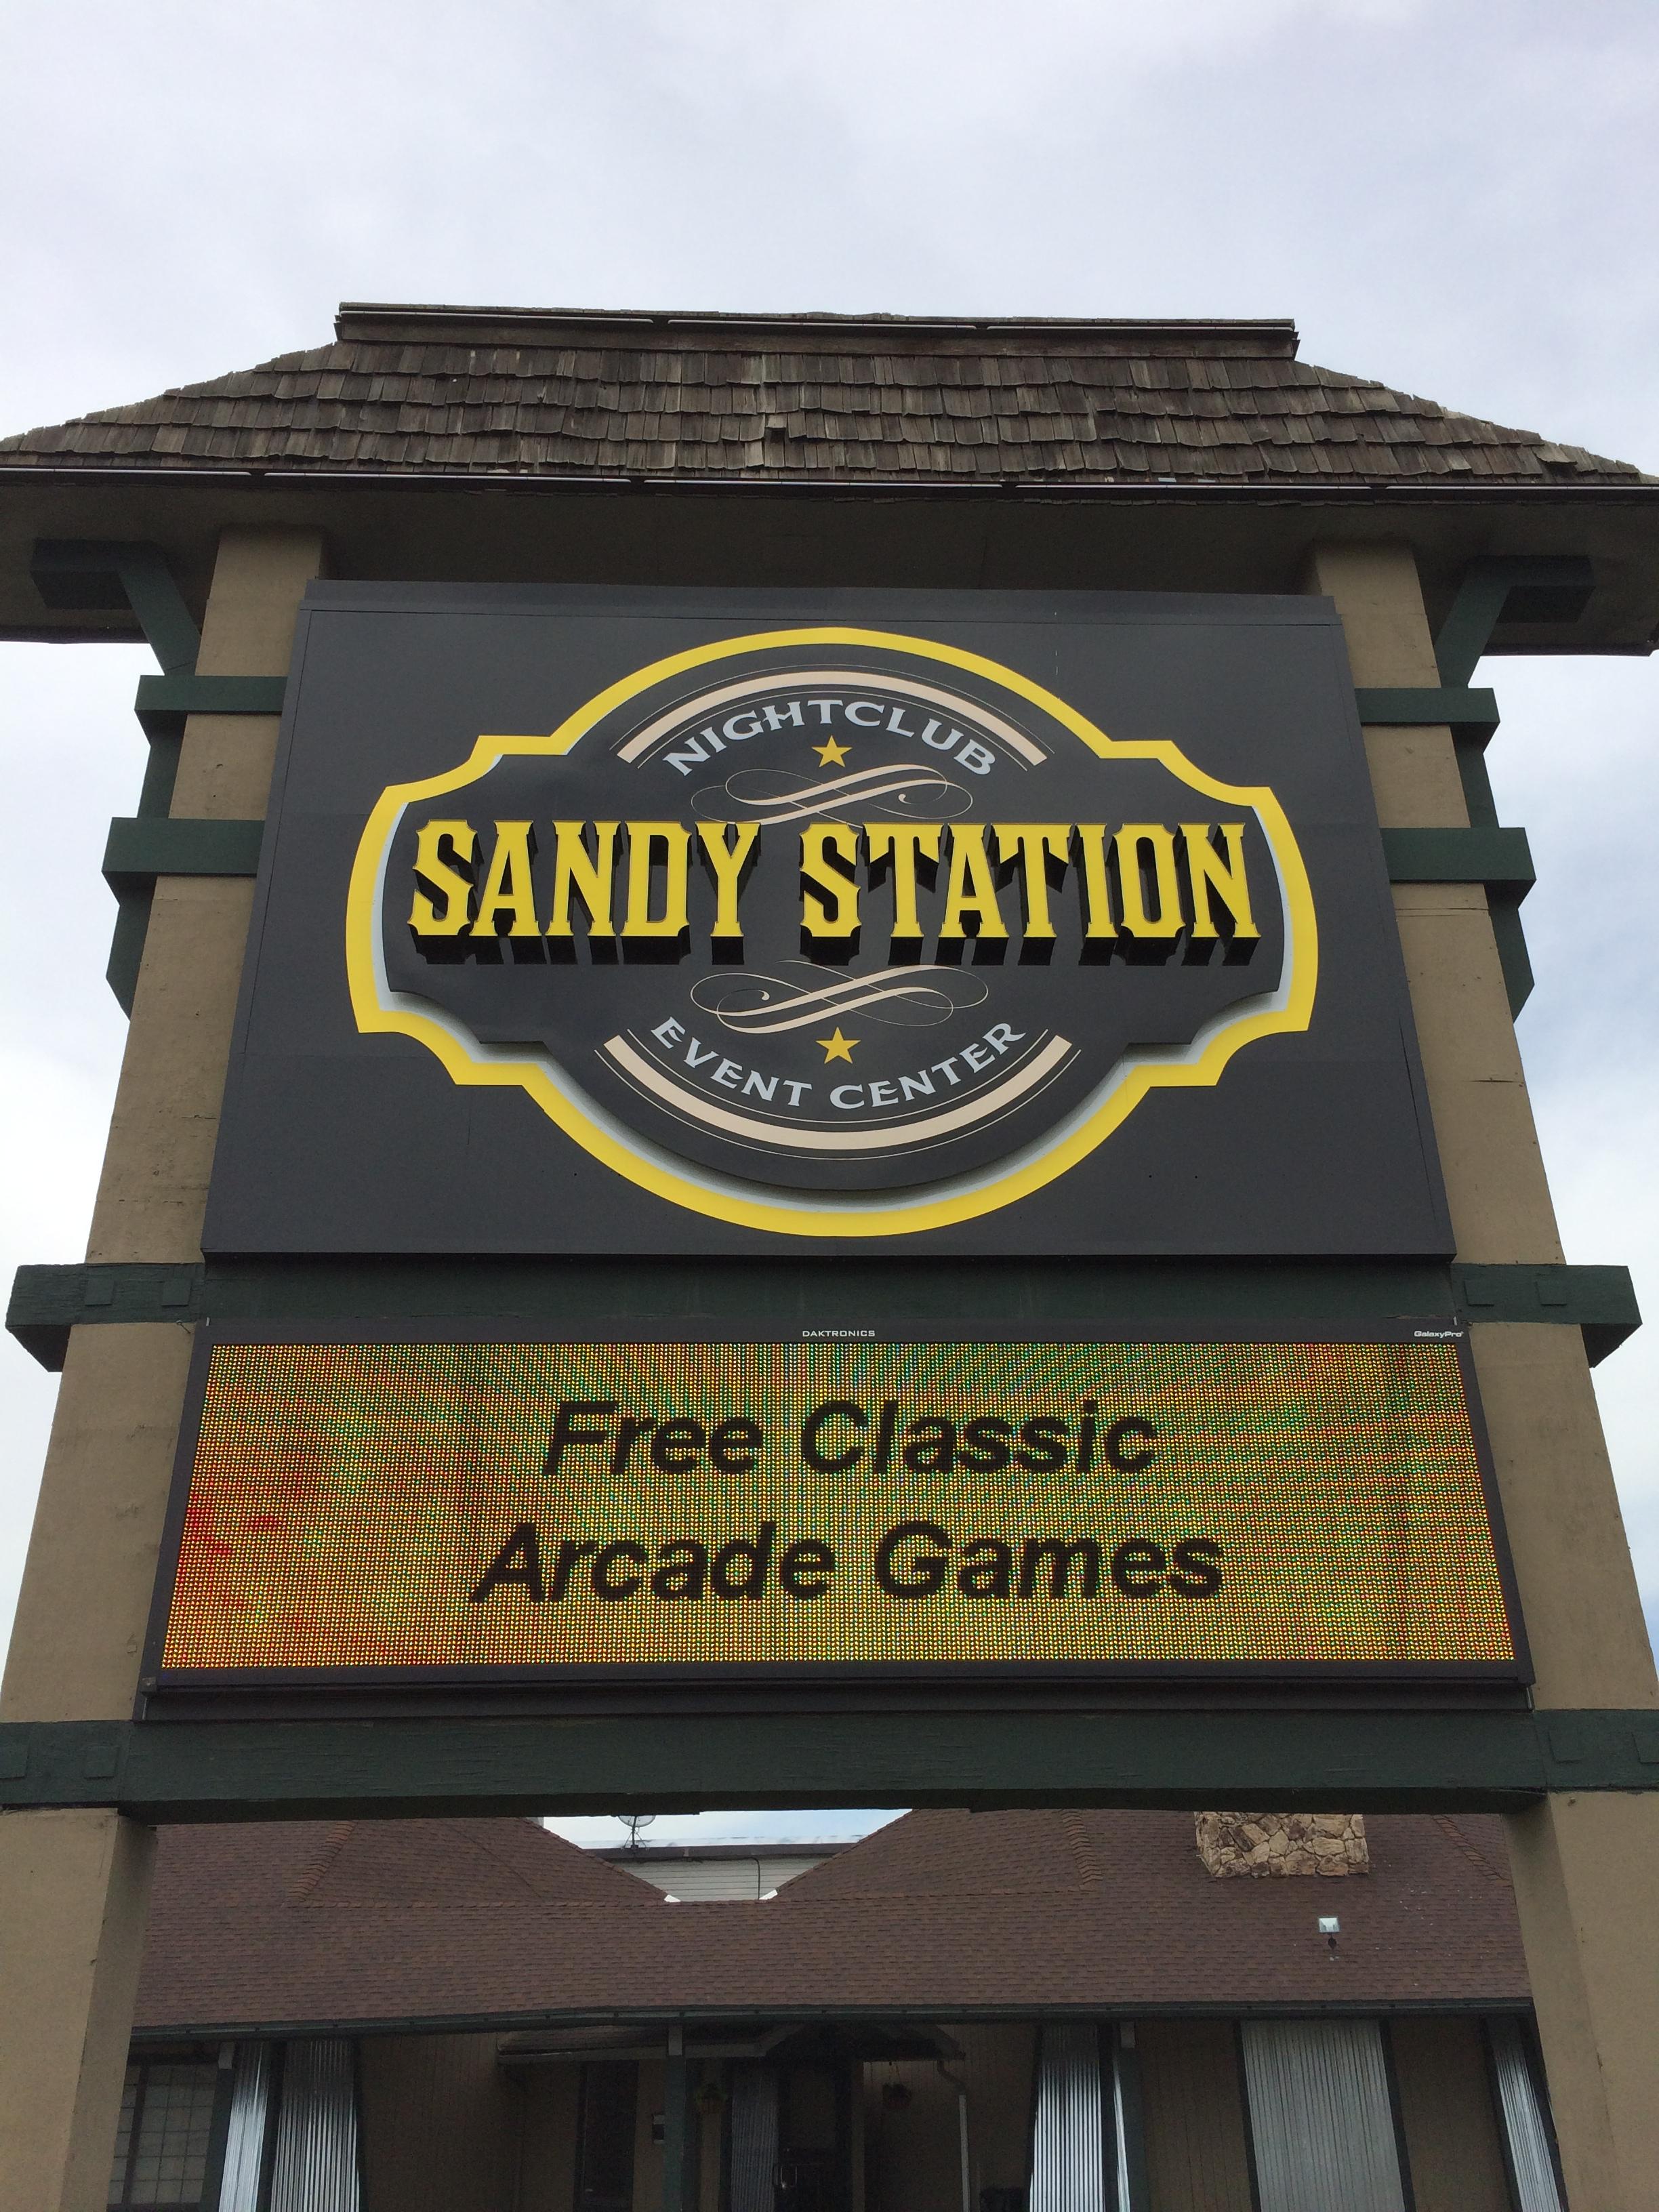 Aloha Sandy Station 171 Pos Technologies